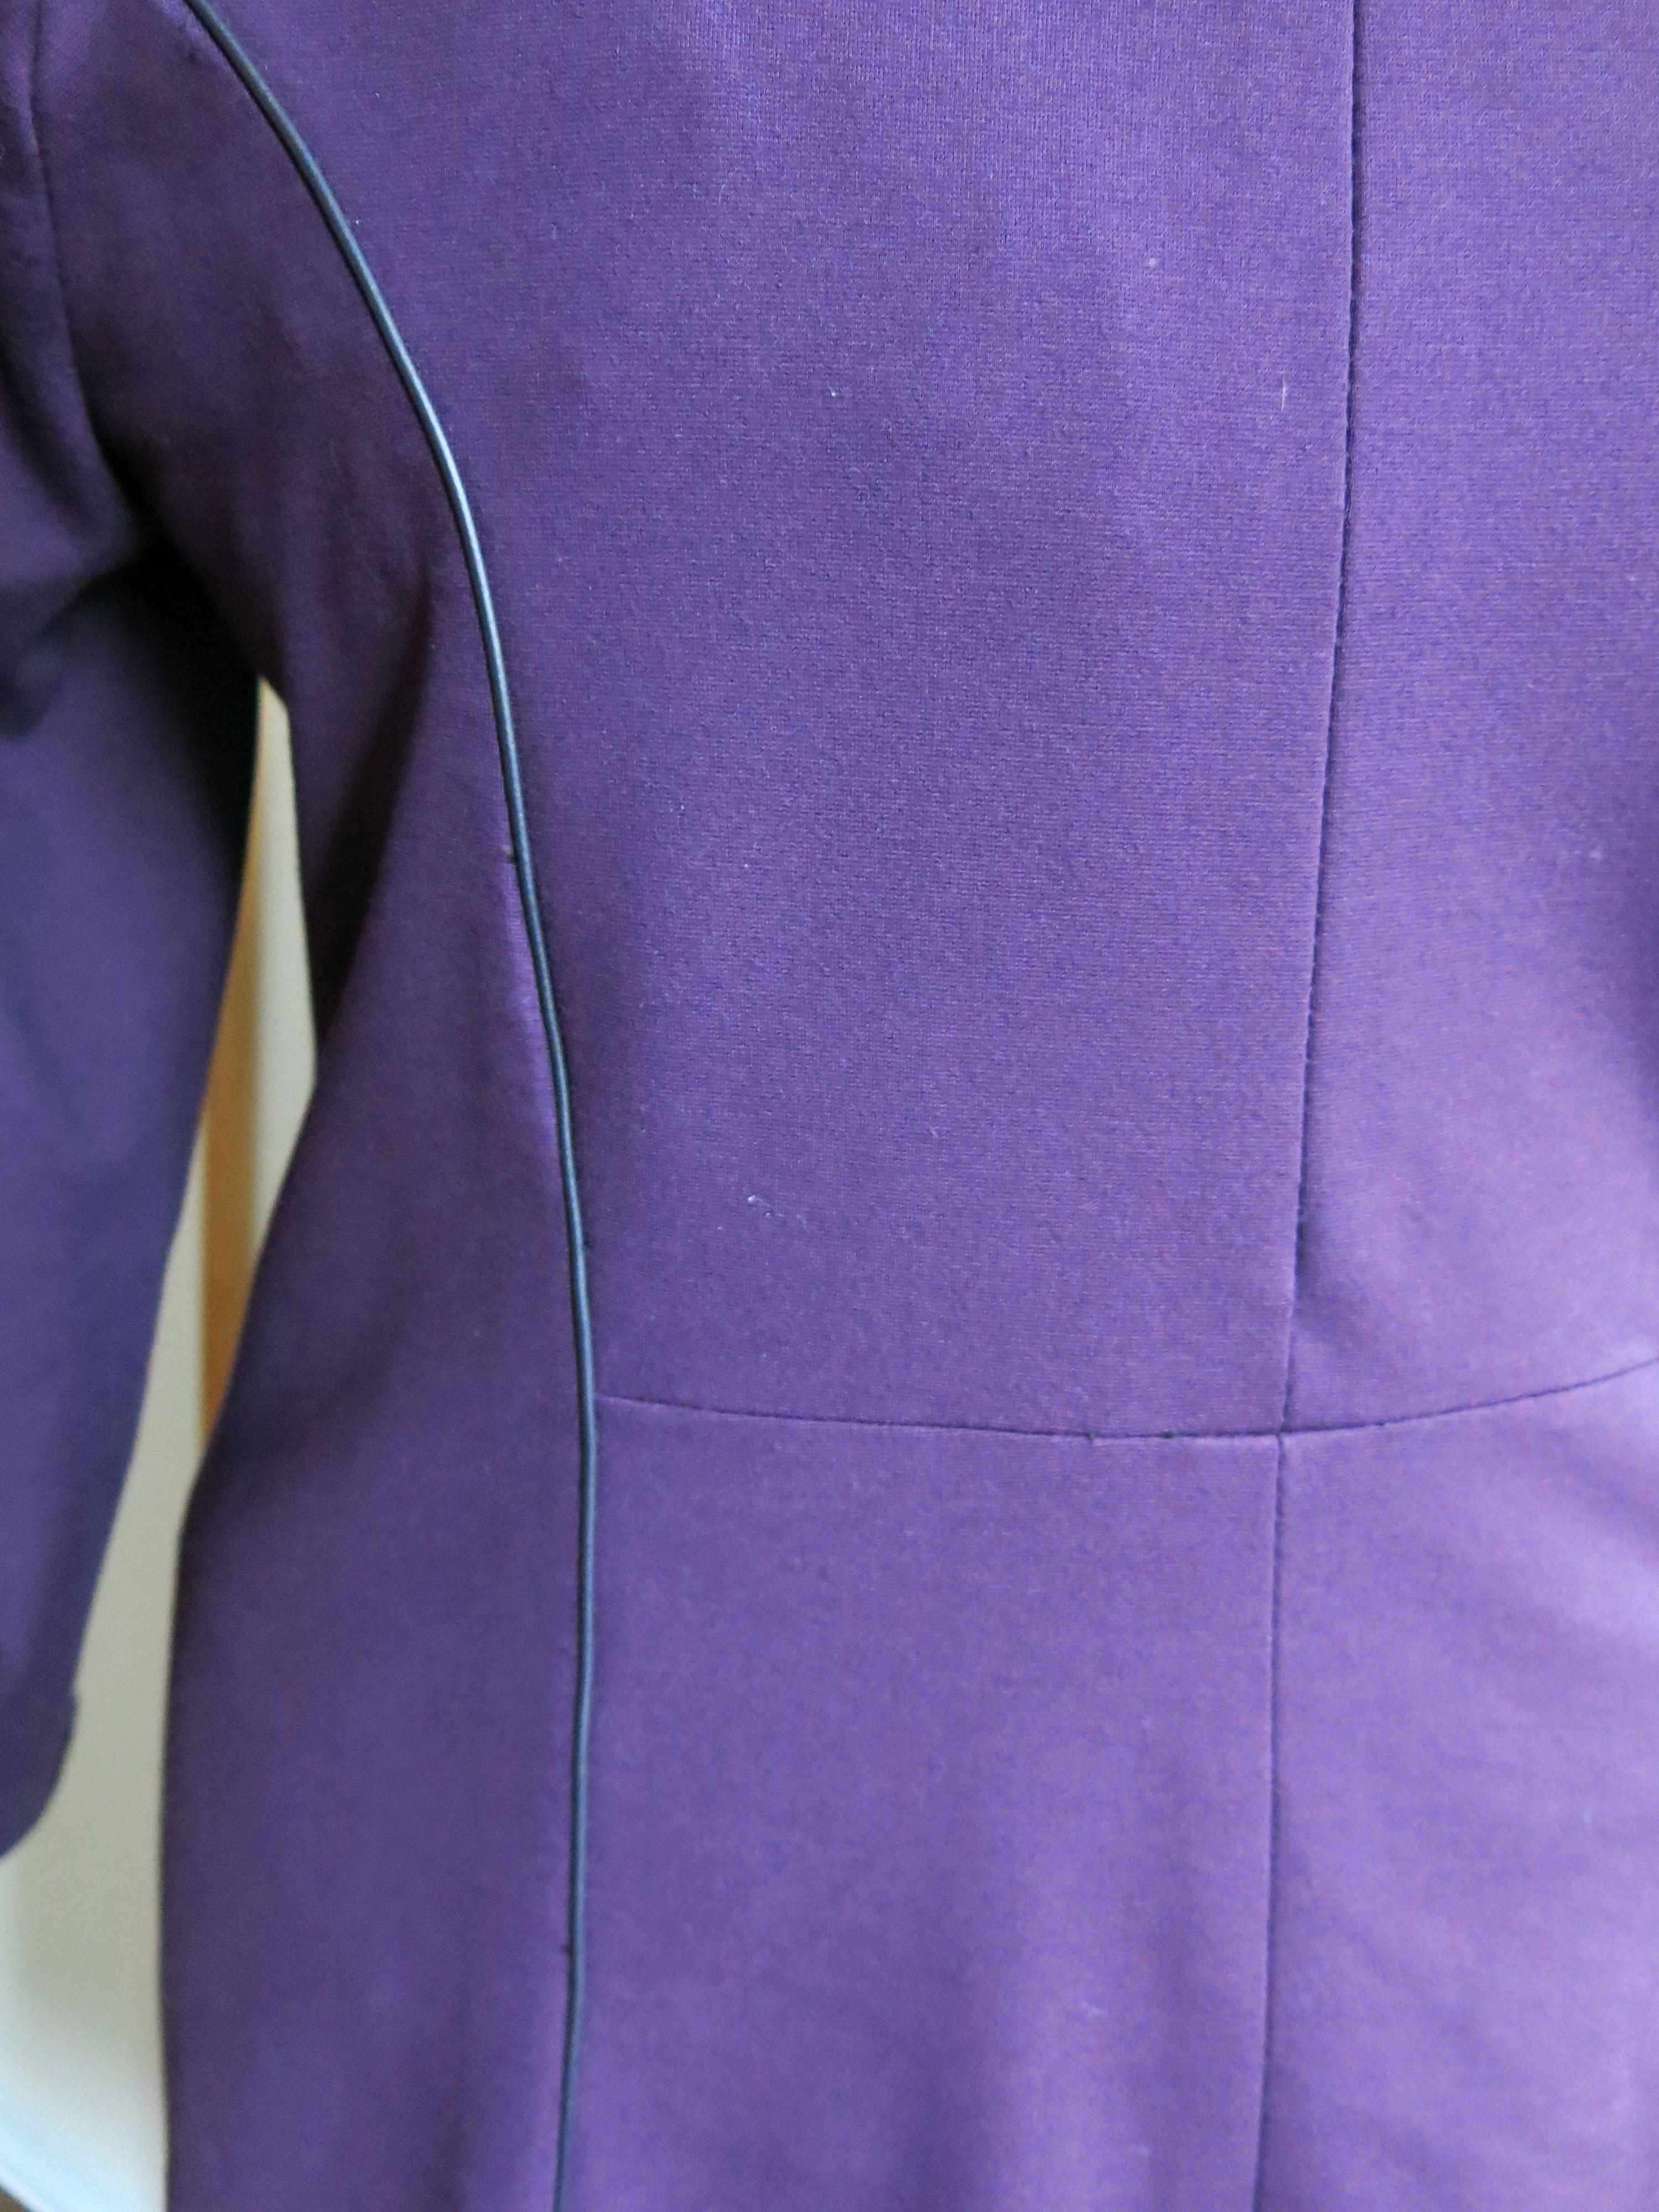 Lila Kleid Detail